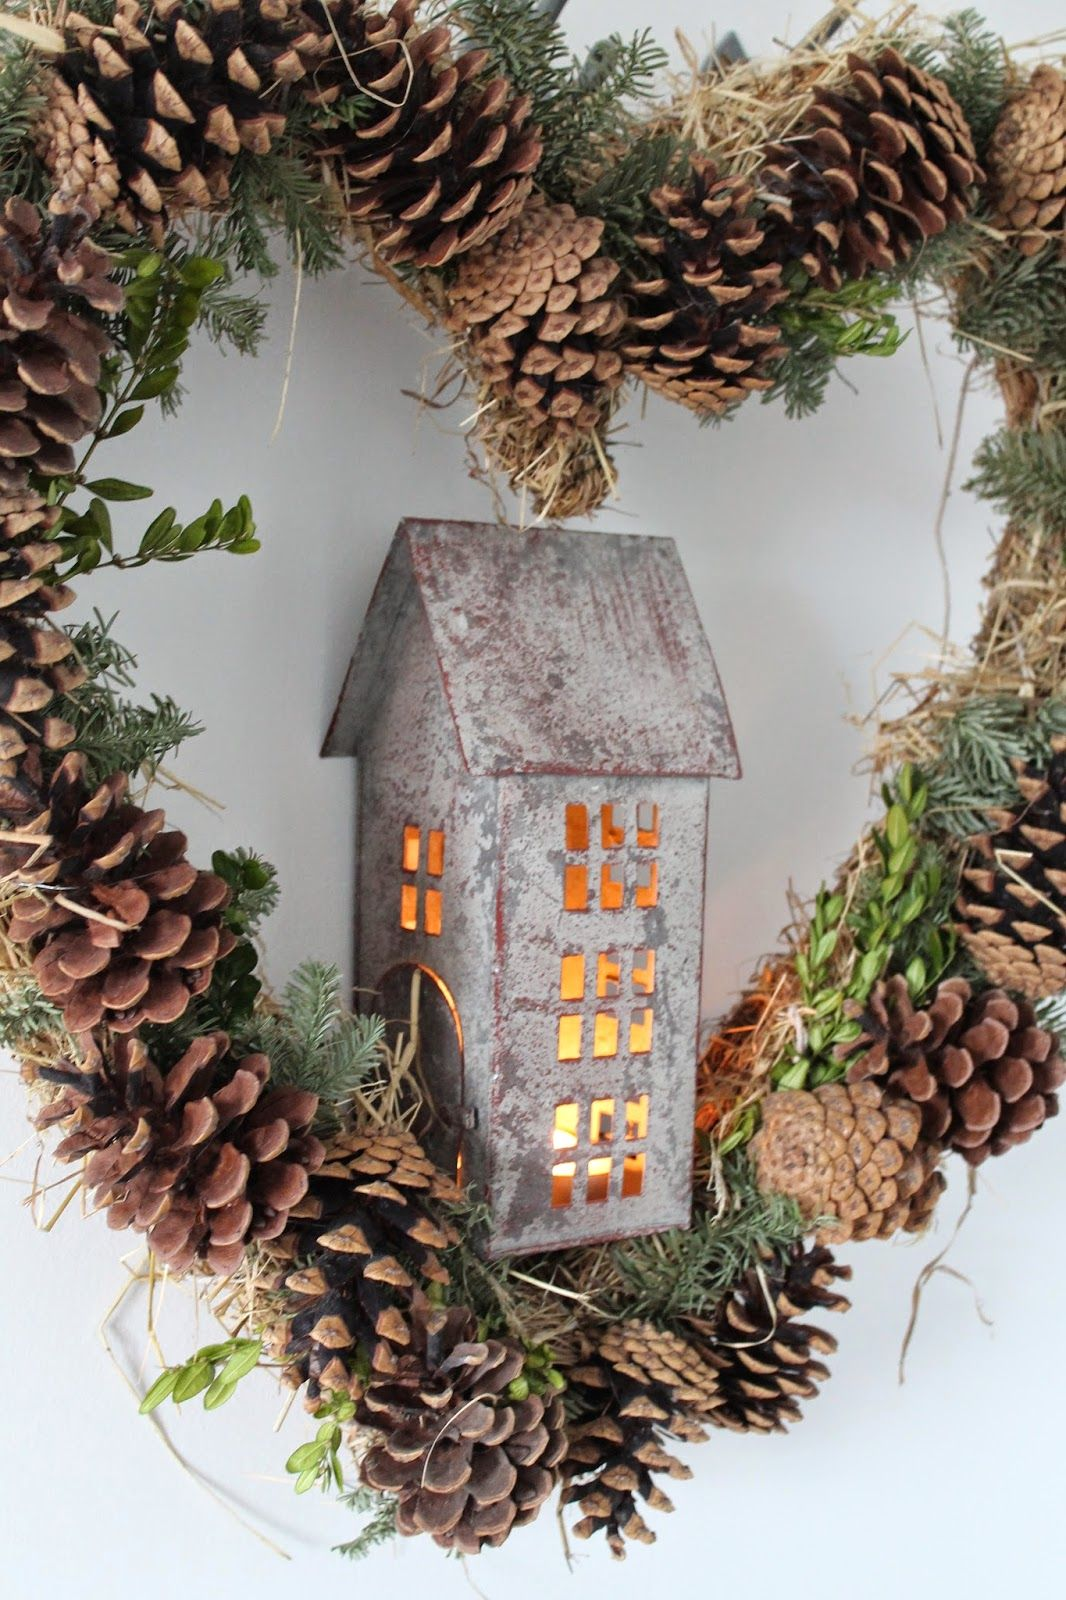 Winter pinecone heart shaped wreath with flecks of greenery and a winter pinecone heart shaped wreath with flecks of greenery and a vintage metal house rubansaba